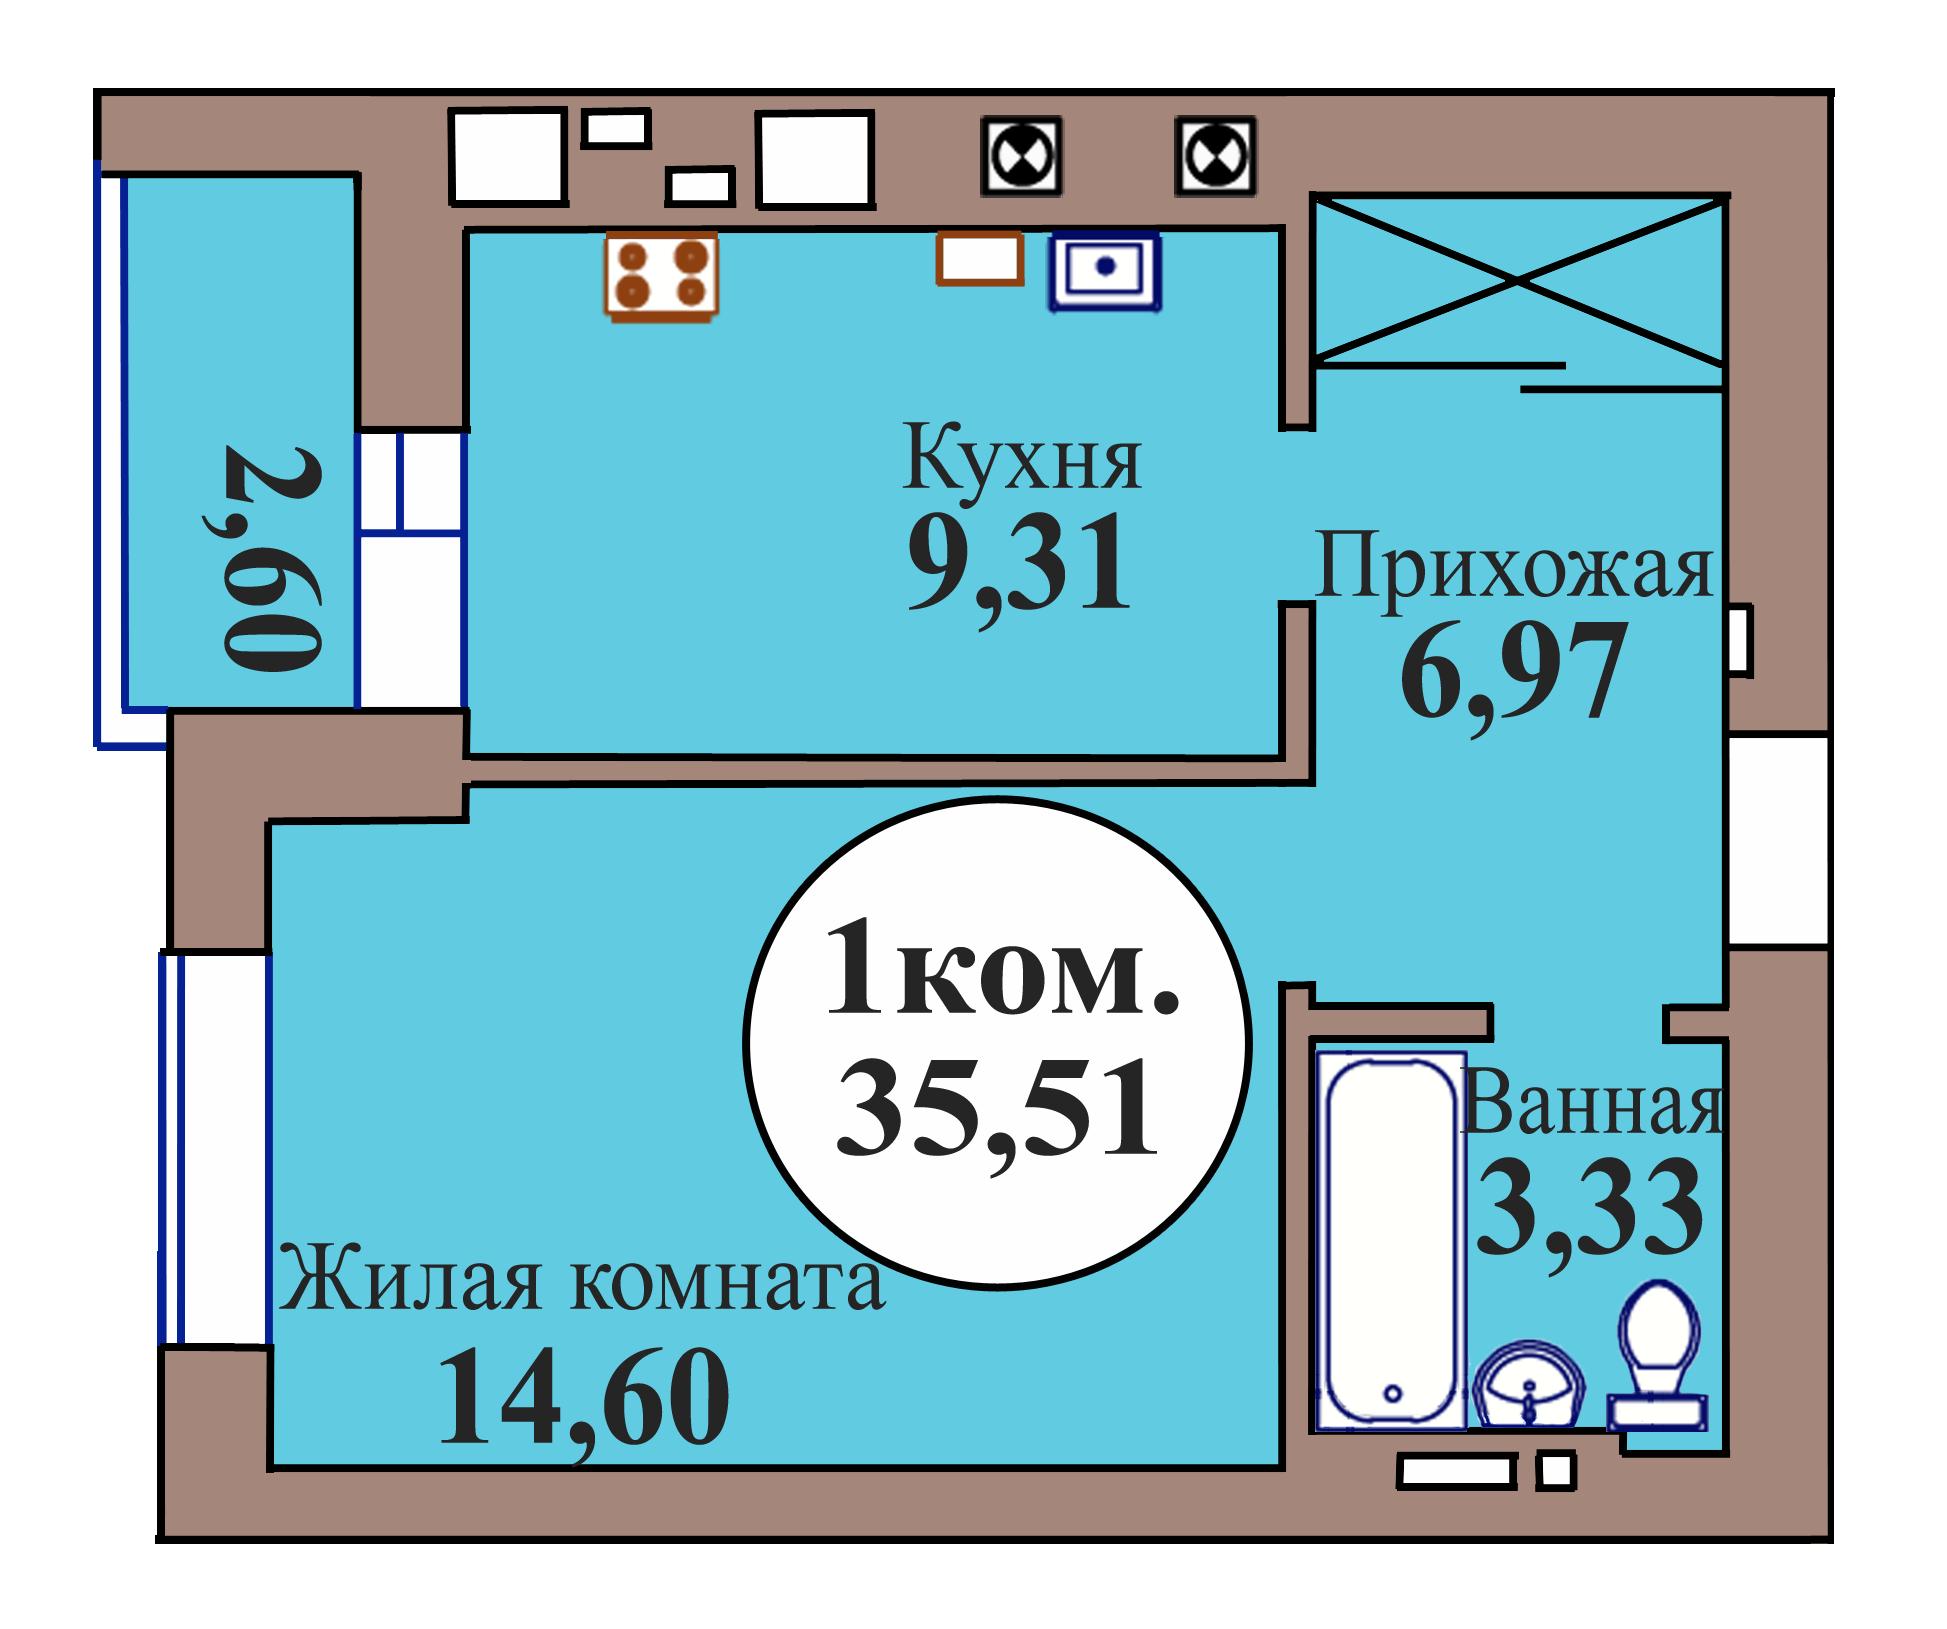 1-комн. кв. по пер. Калининградский, 5 кв. 14 в Калининграде